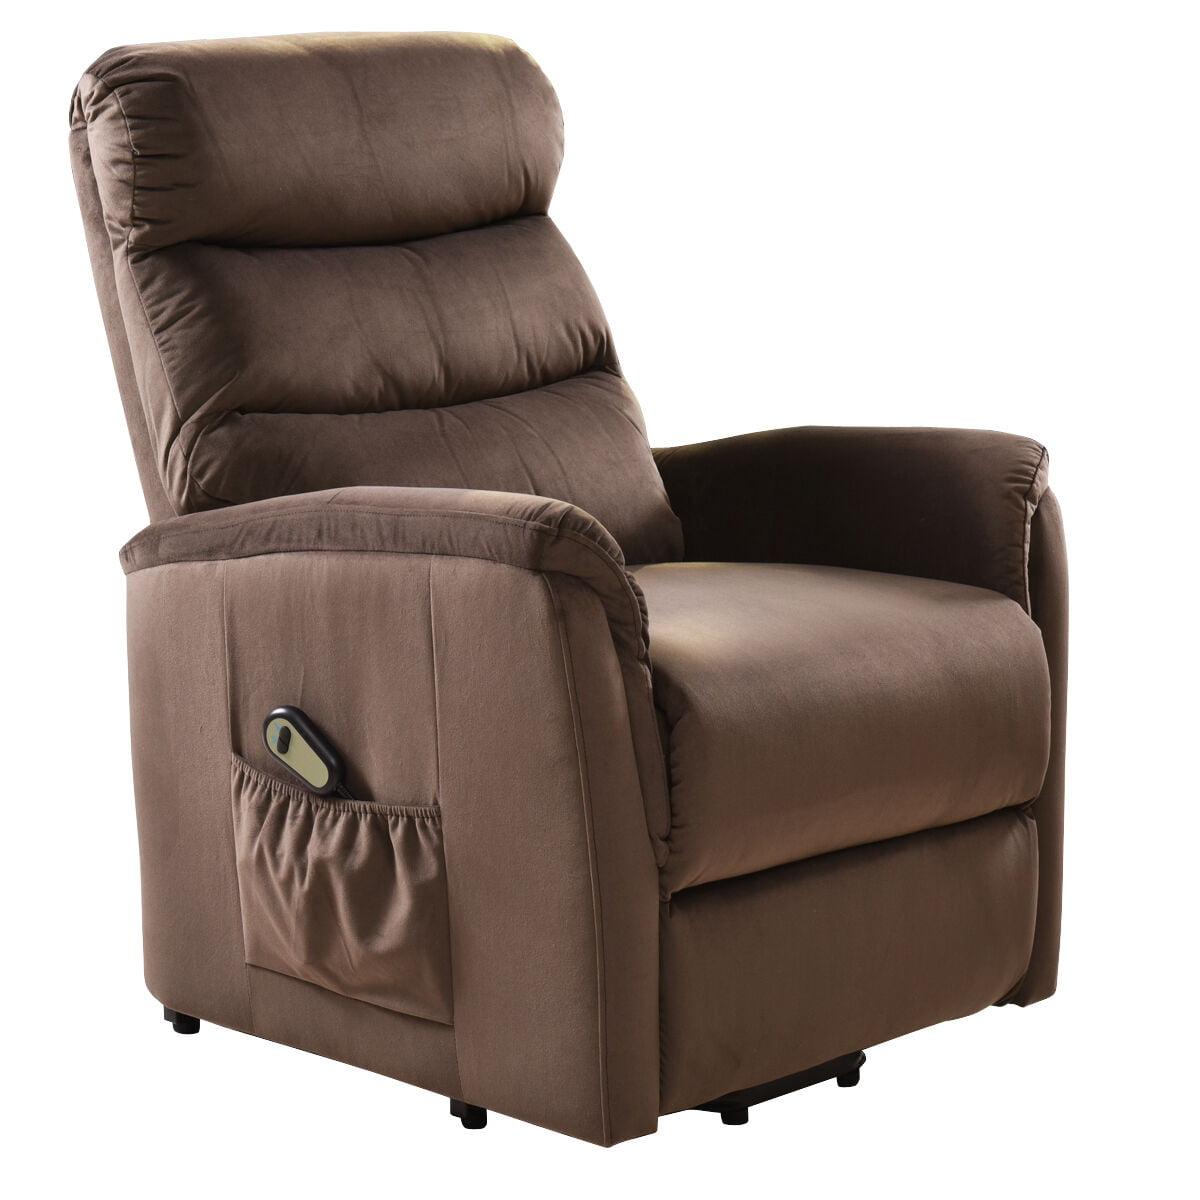 Electric Lift Chair Recliner Sofa